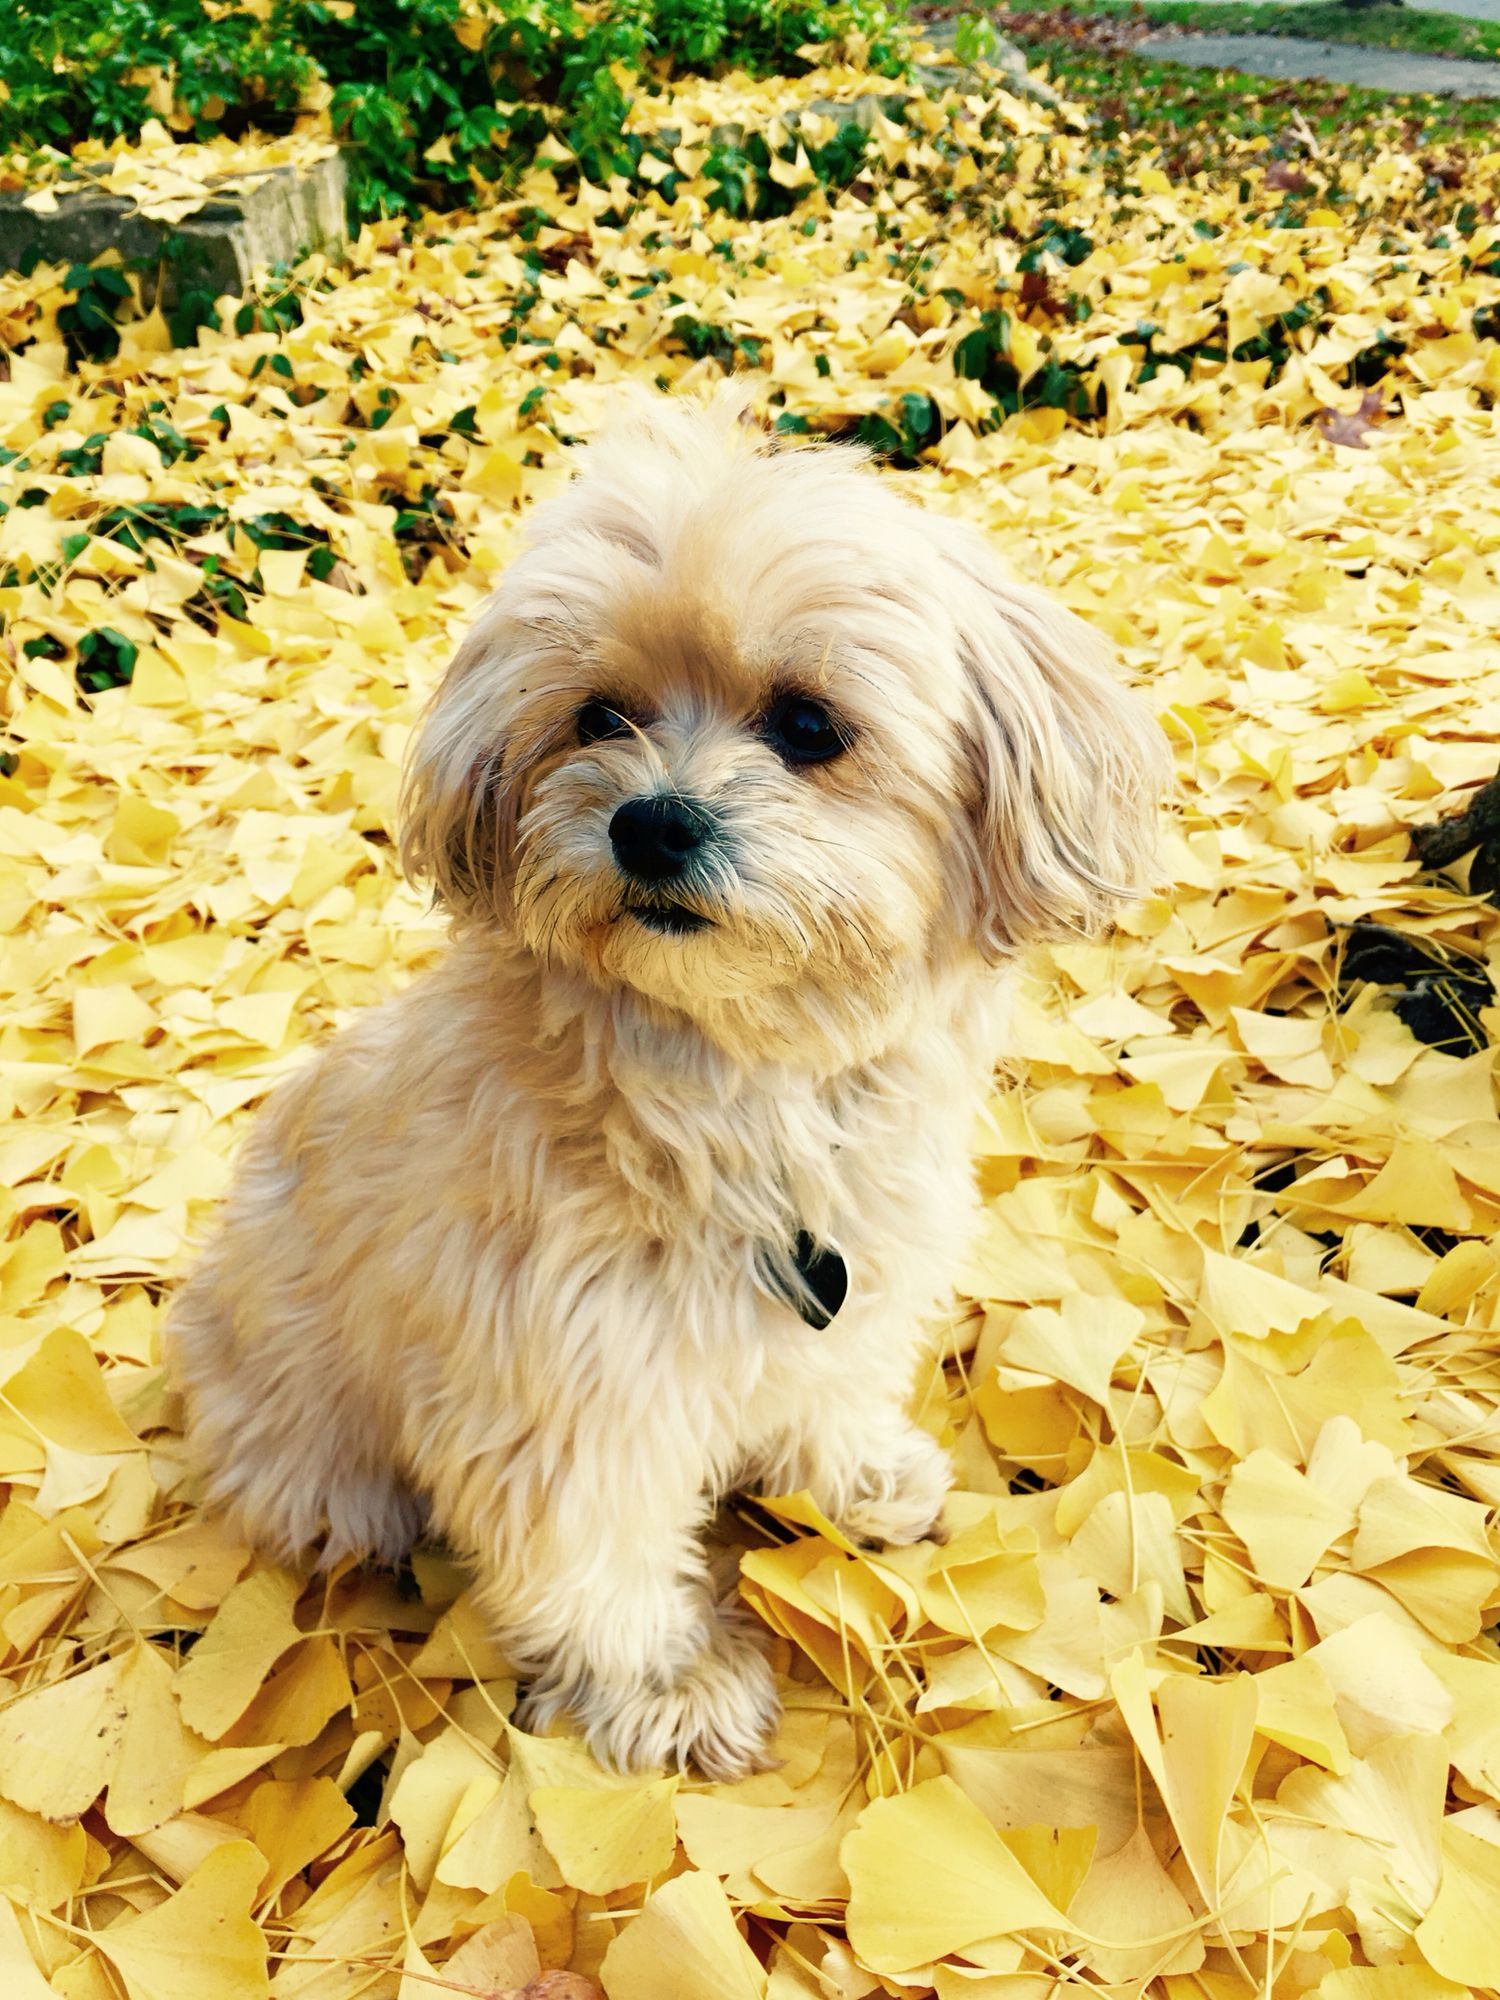 Sweet Yorki Poo Wonderful Family Dog Yorkie Poodle Yorkie Poo Puppies Yorkie Poo